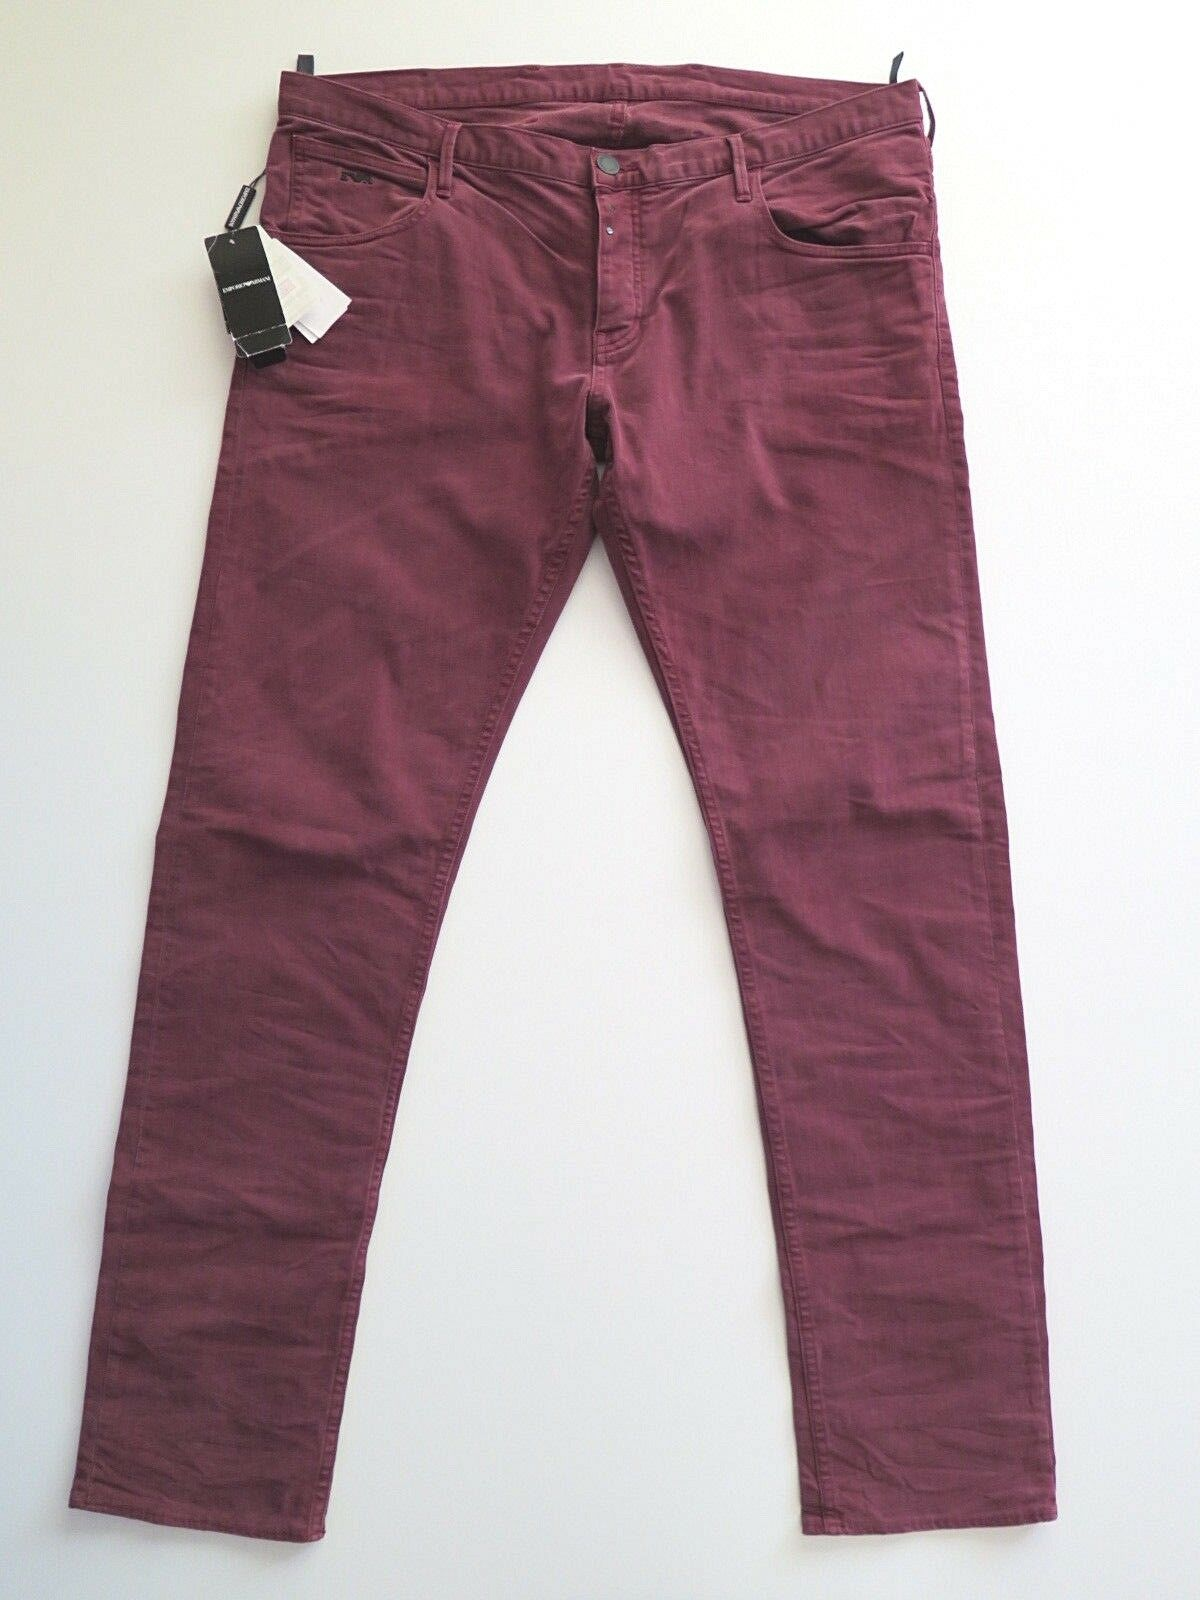 NEW Emporio Armani Johnny Slim Fit Stretch Men's Jeans Pant Size 40 - W40 L36